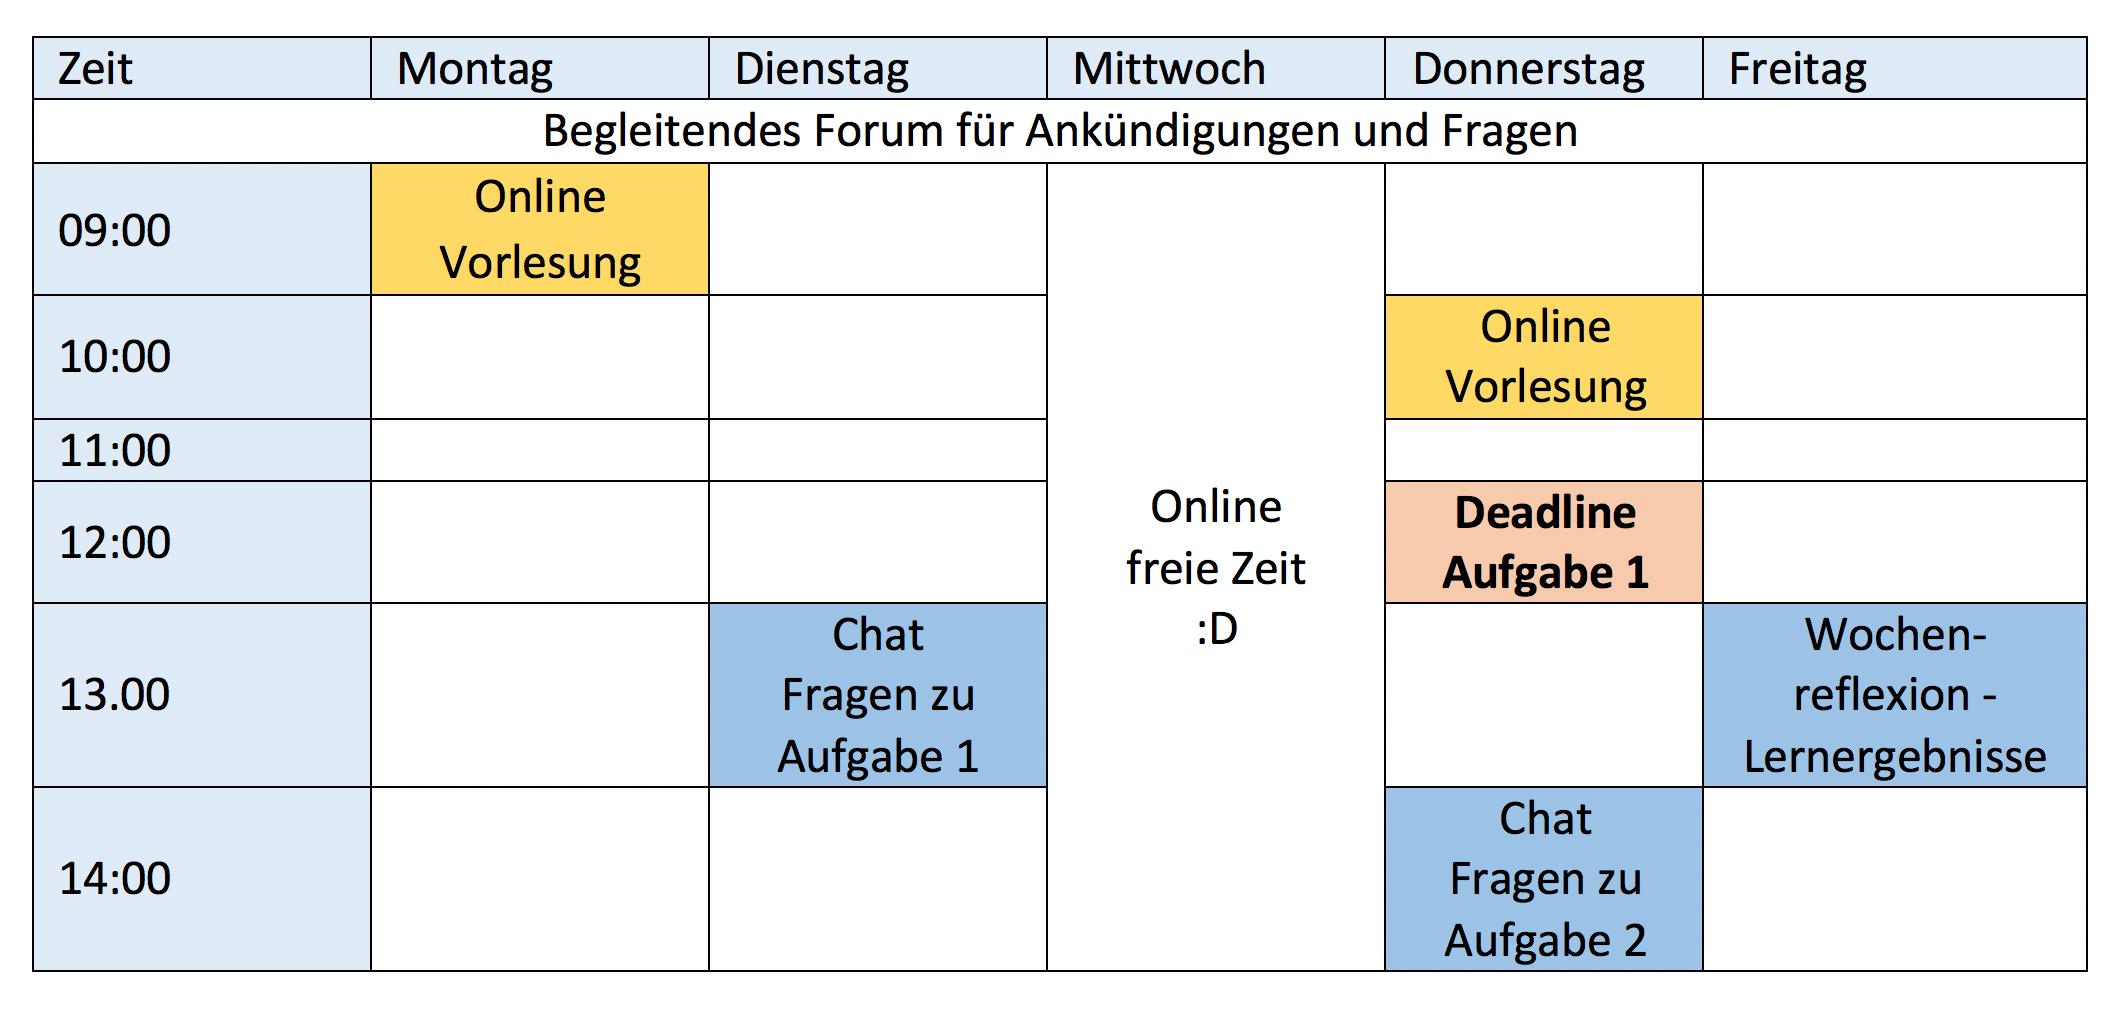 Farbcode: Gelb – Synchrone Treffen über MS Teams; Blau – Asynchrone Aufgaben in Moodle; Rot – Deadlines